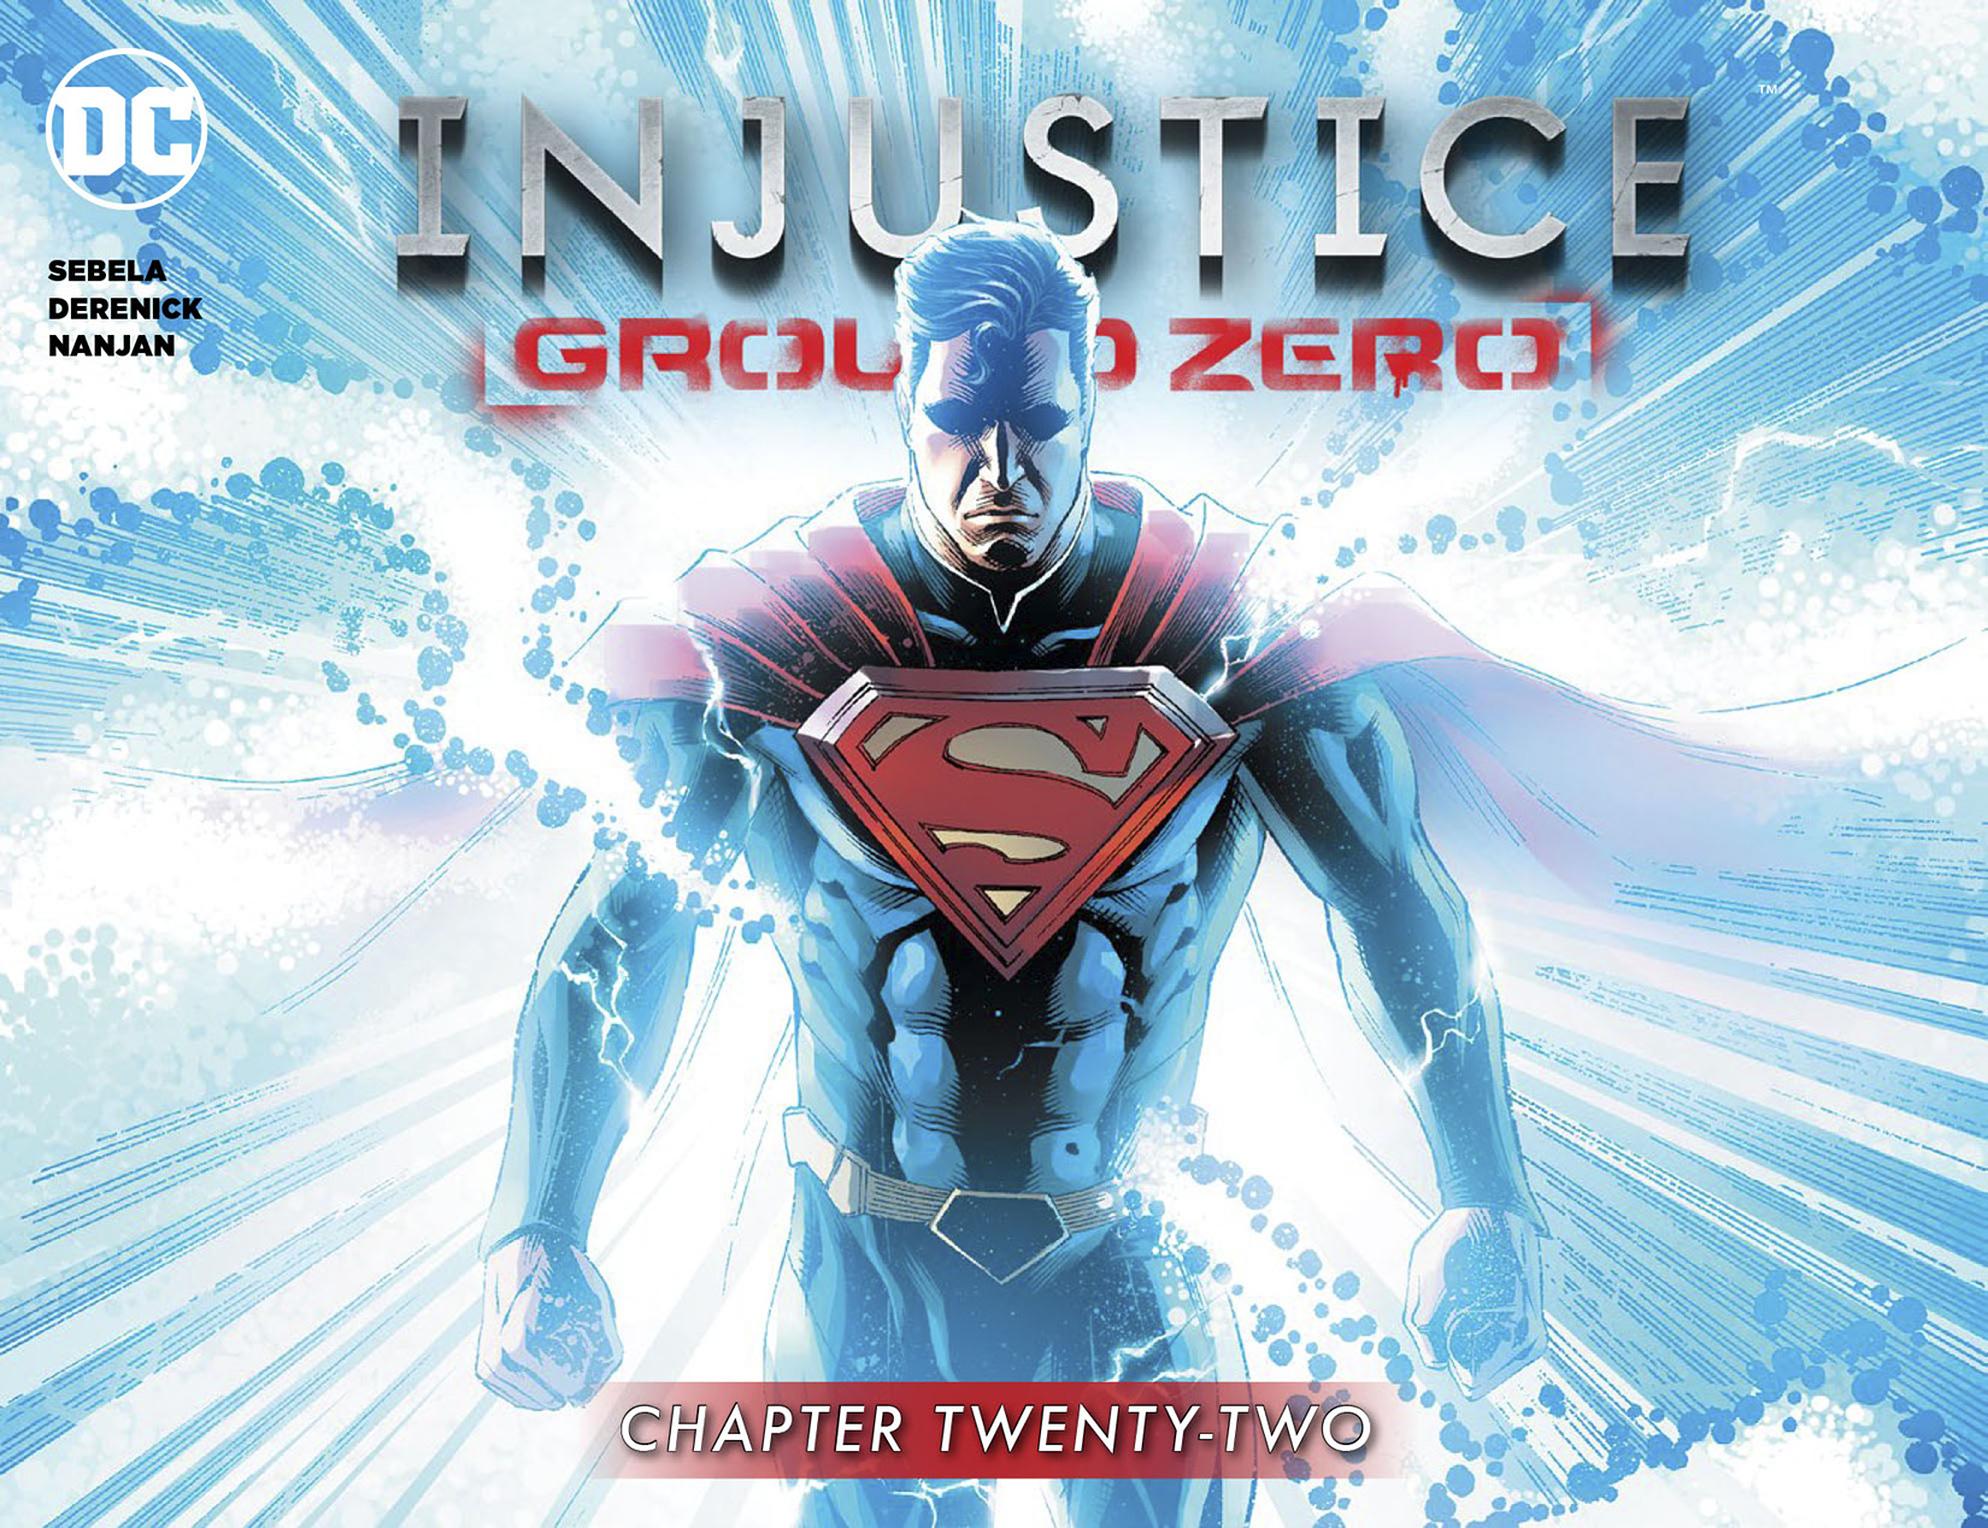 Read online Injustice: Ground Zero comic -  Issue #22 - 1